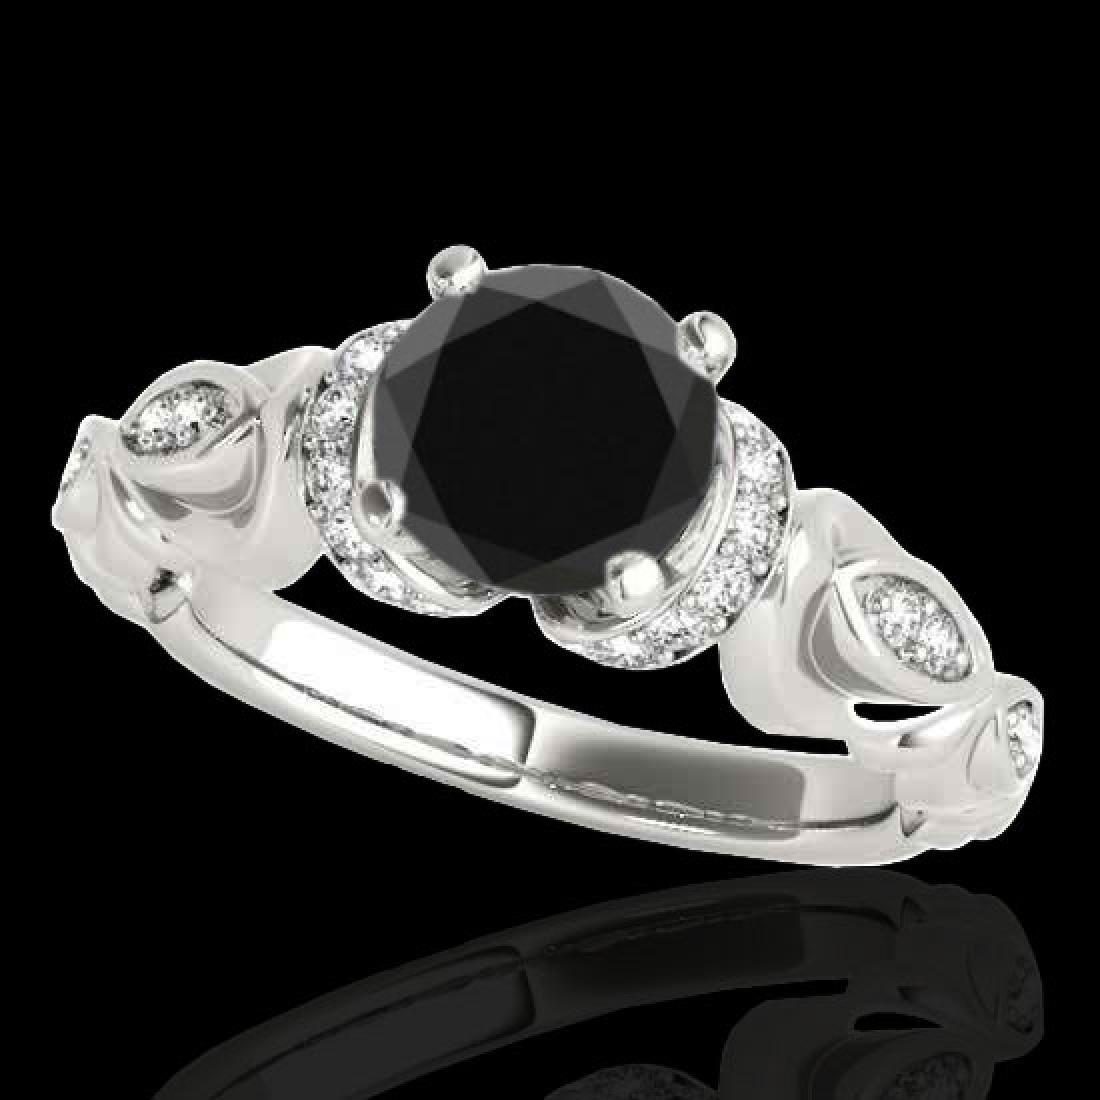 1.2 CTW Certified VS Black Diamond Solitaire Antique